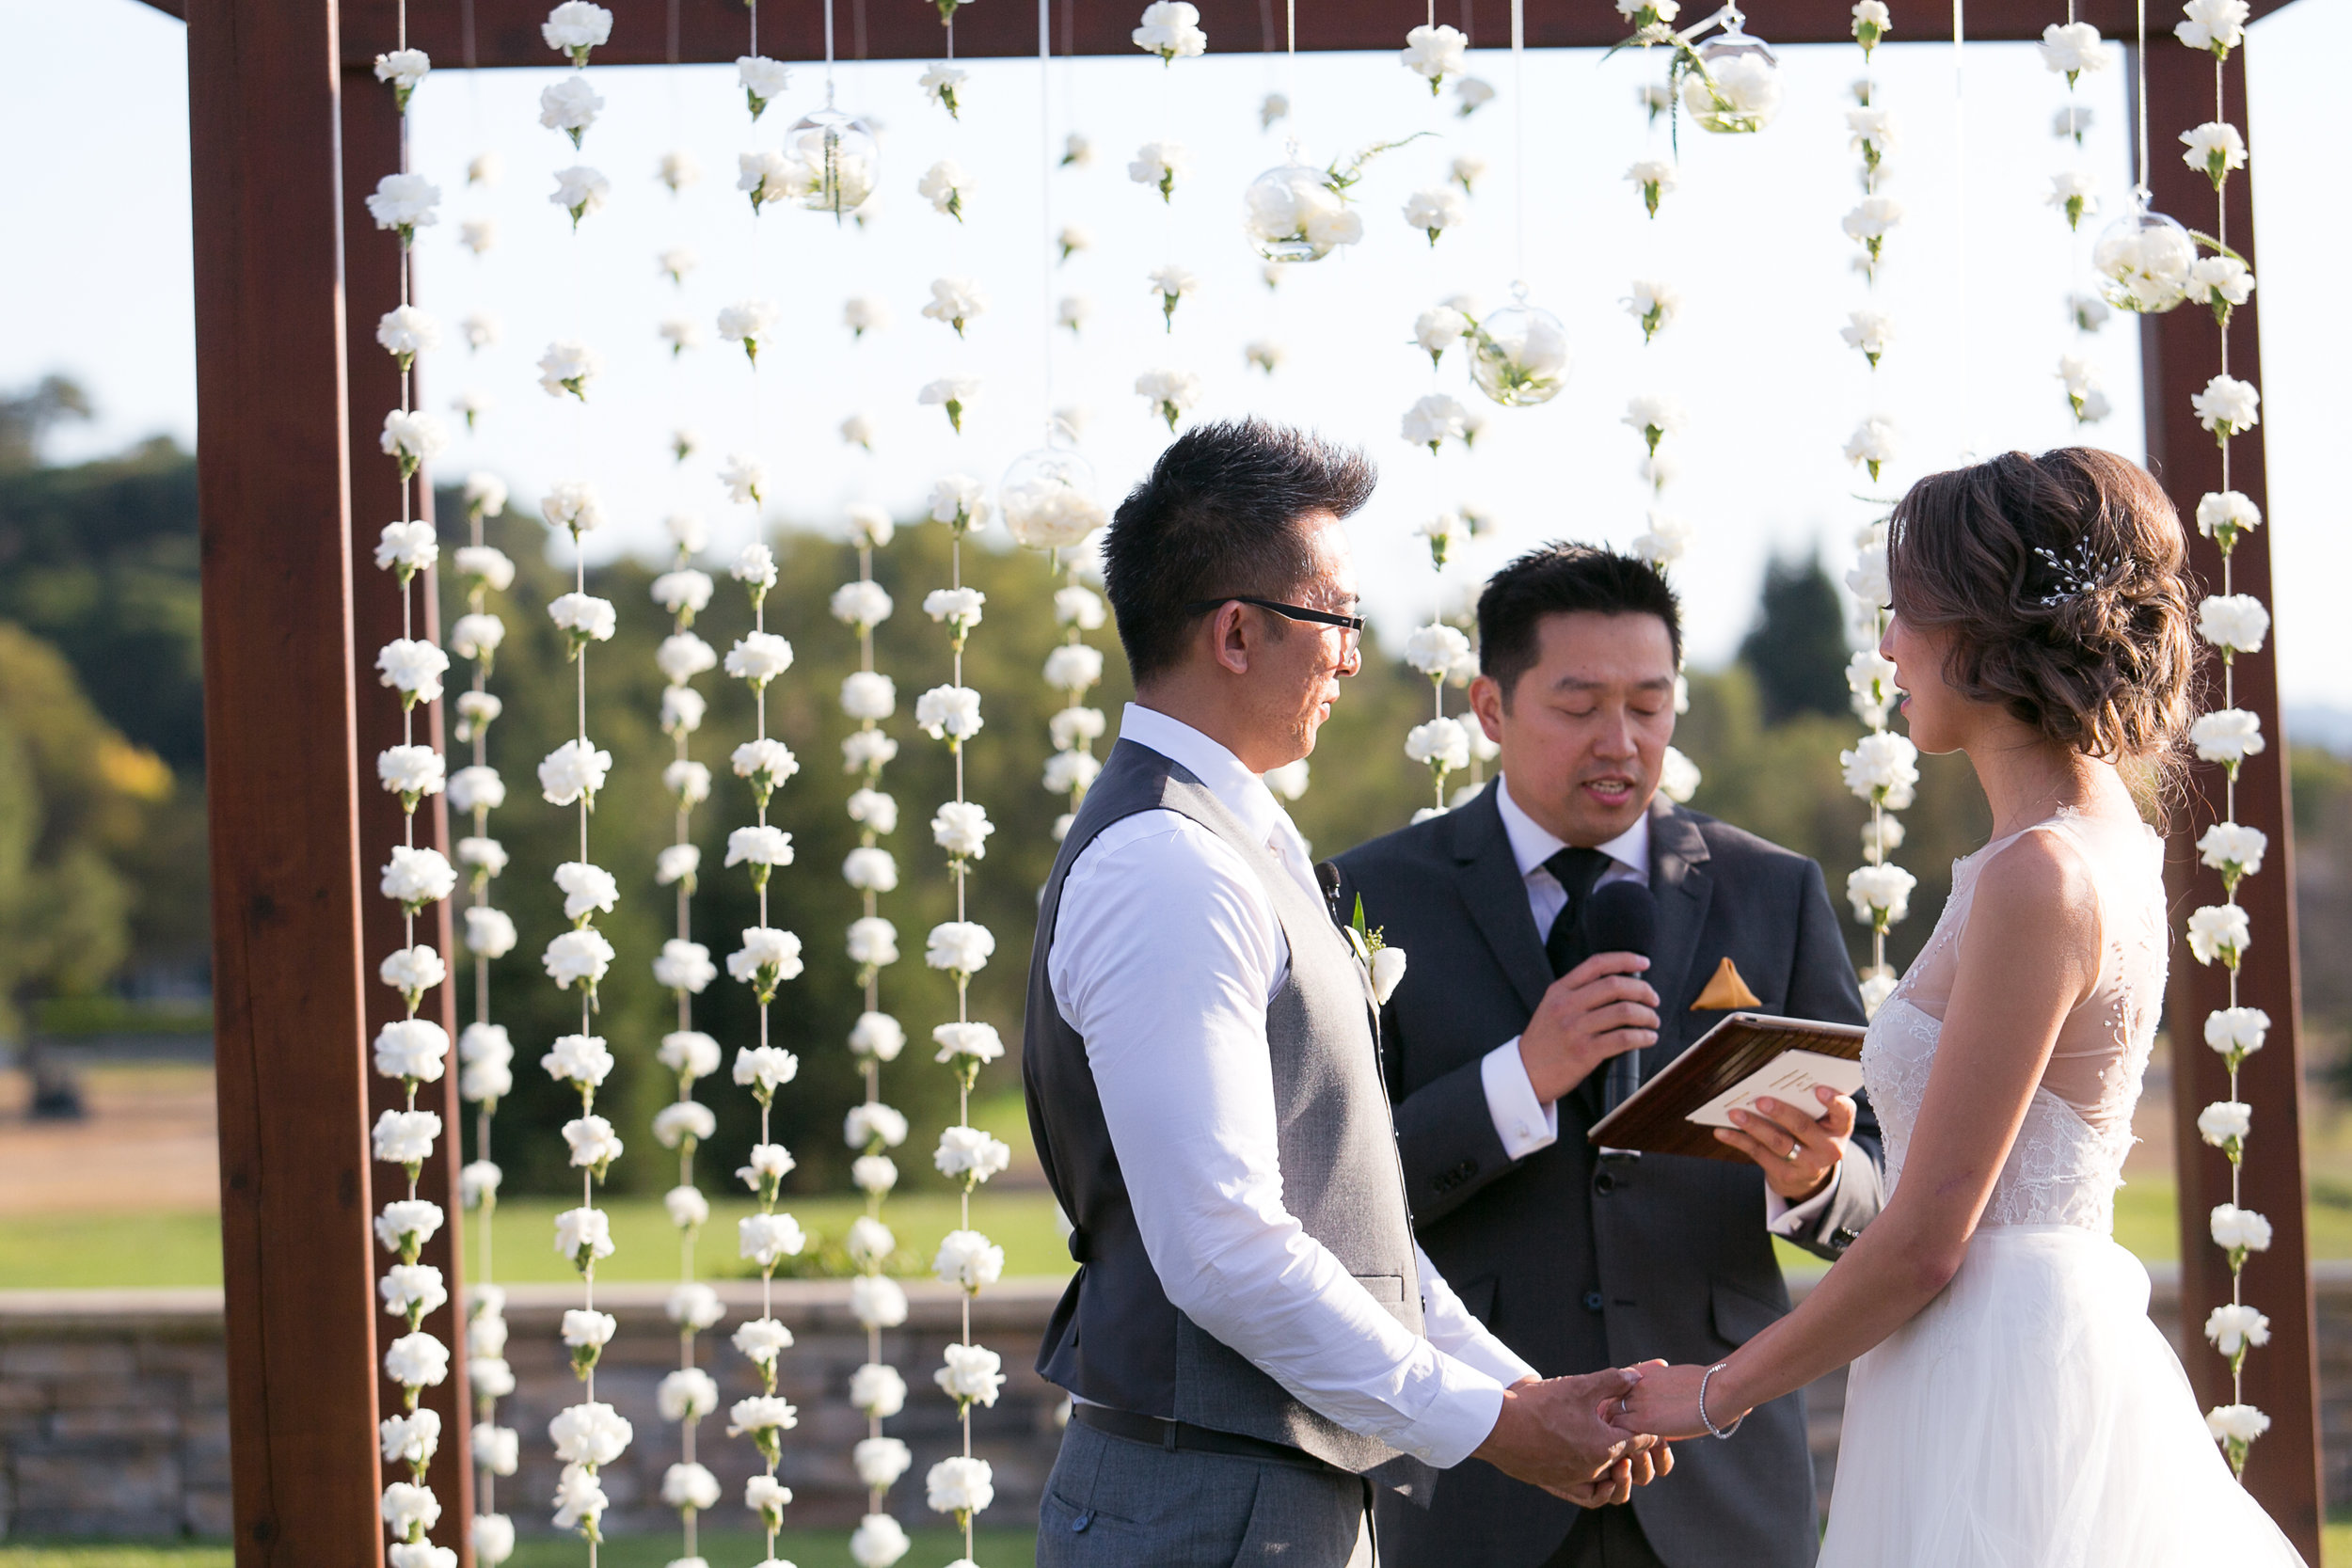 Peacock_Gap_Golf_Club_Wedding_012.jpg